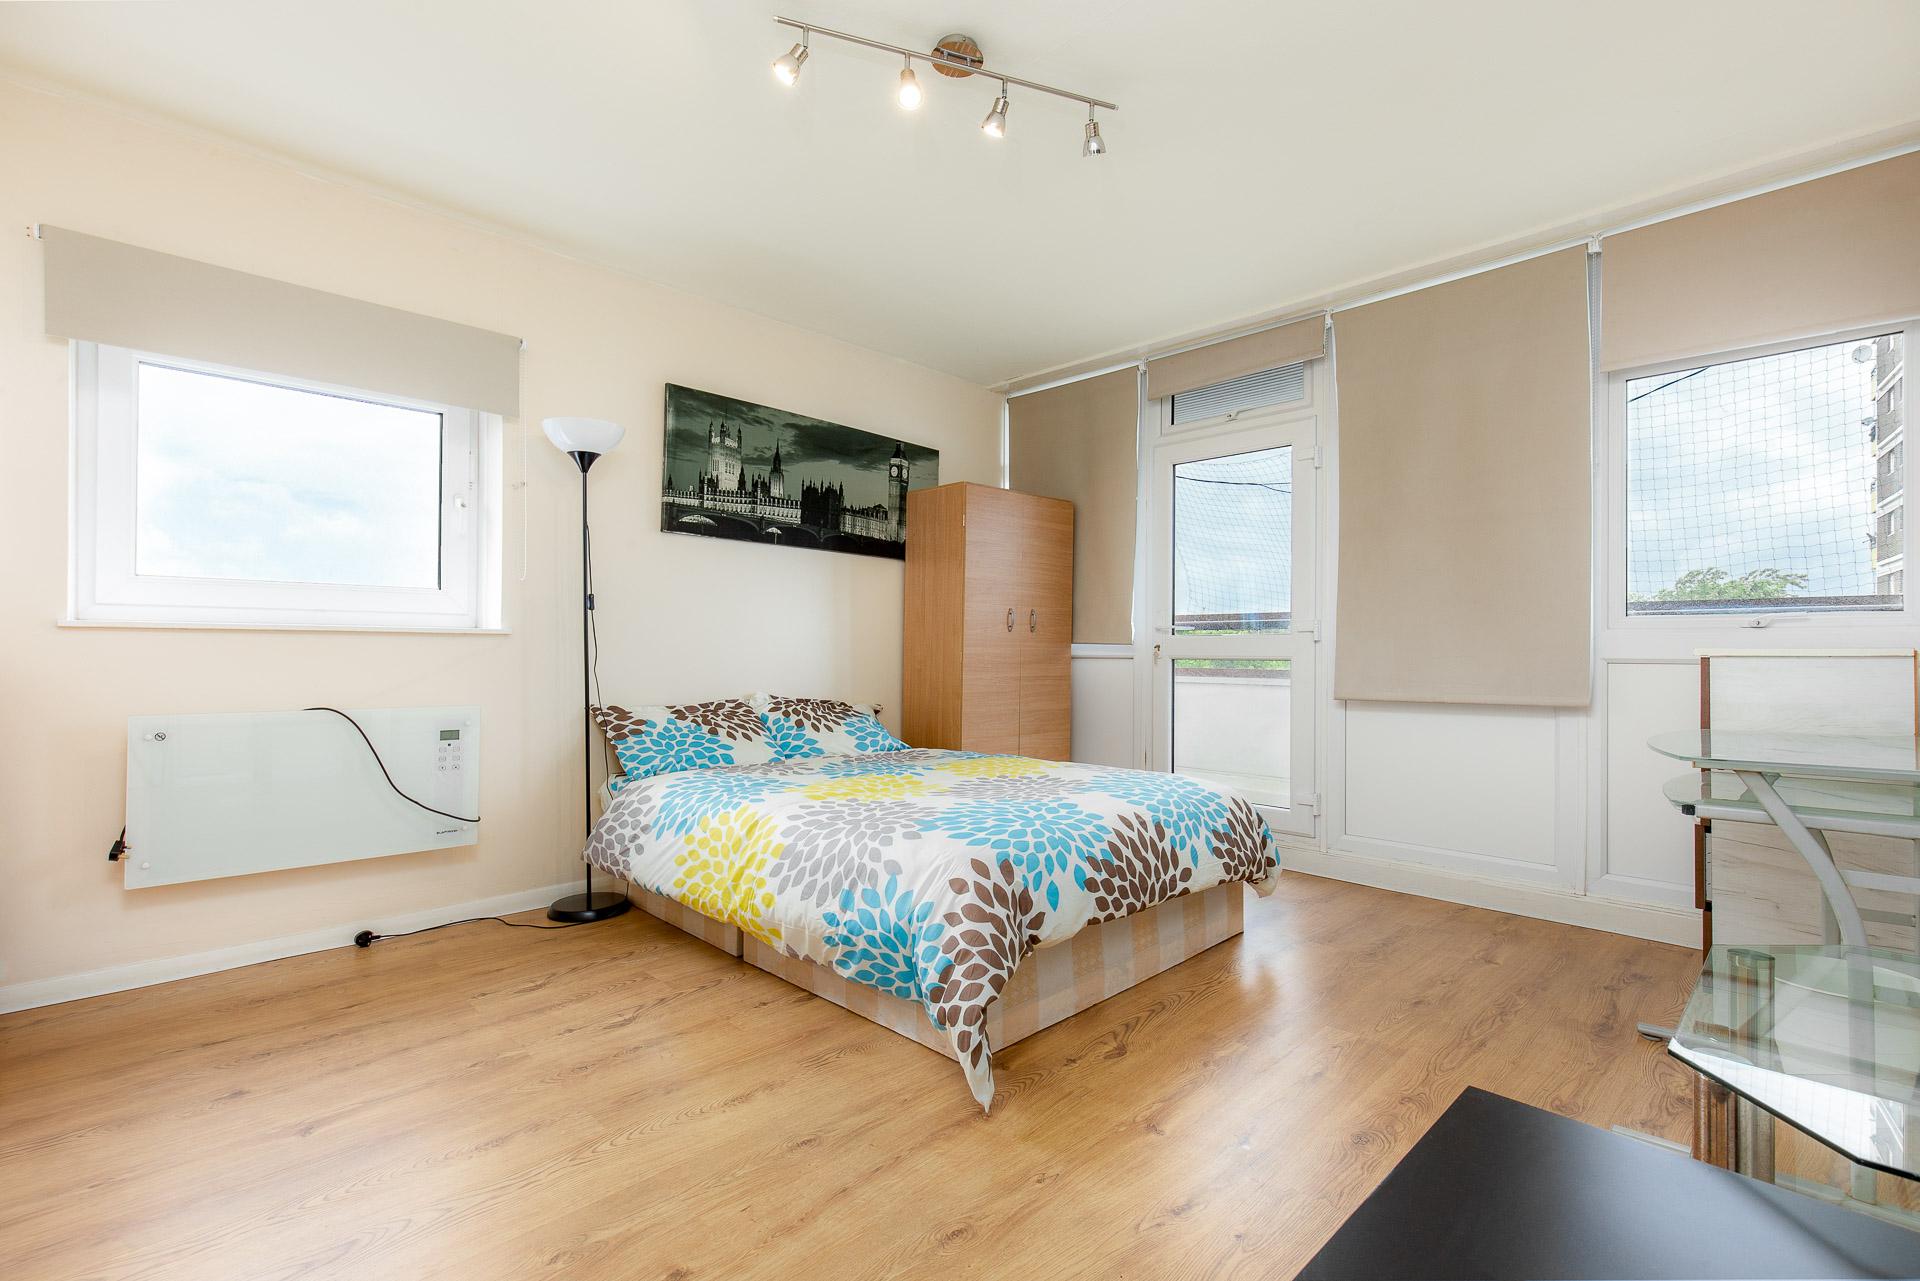 Queensland House London Deluxe Guest Room 3 photo 20449786